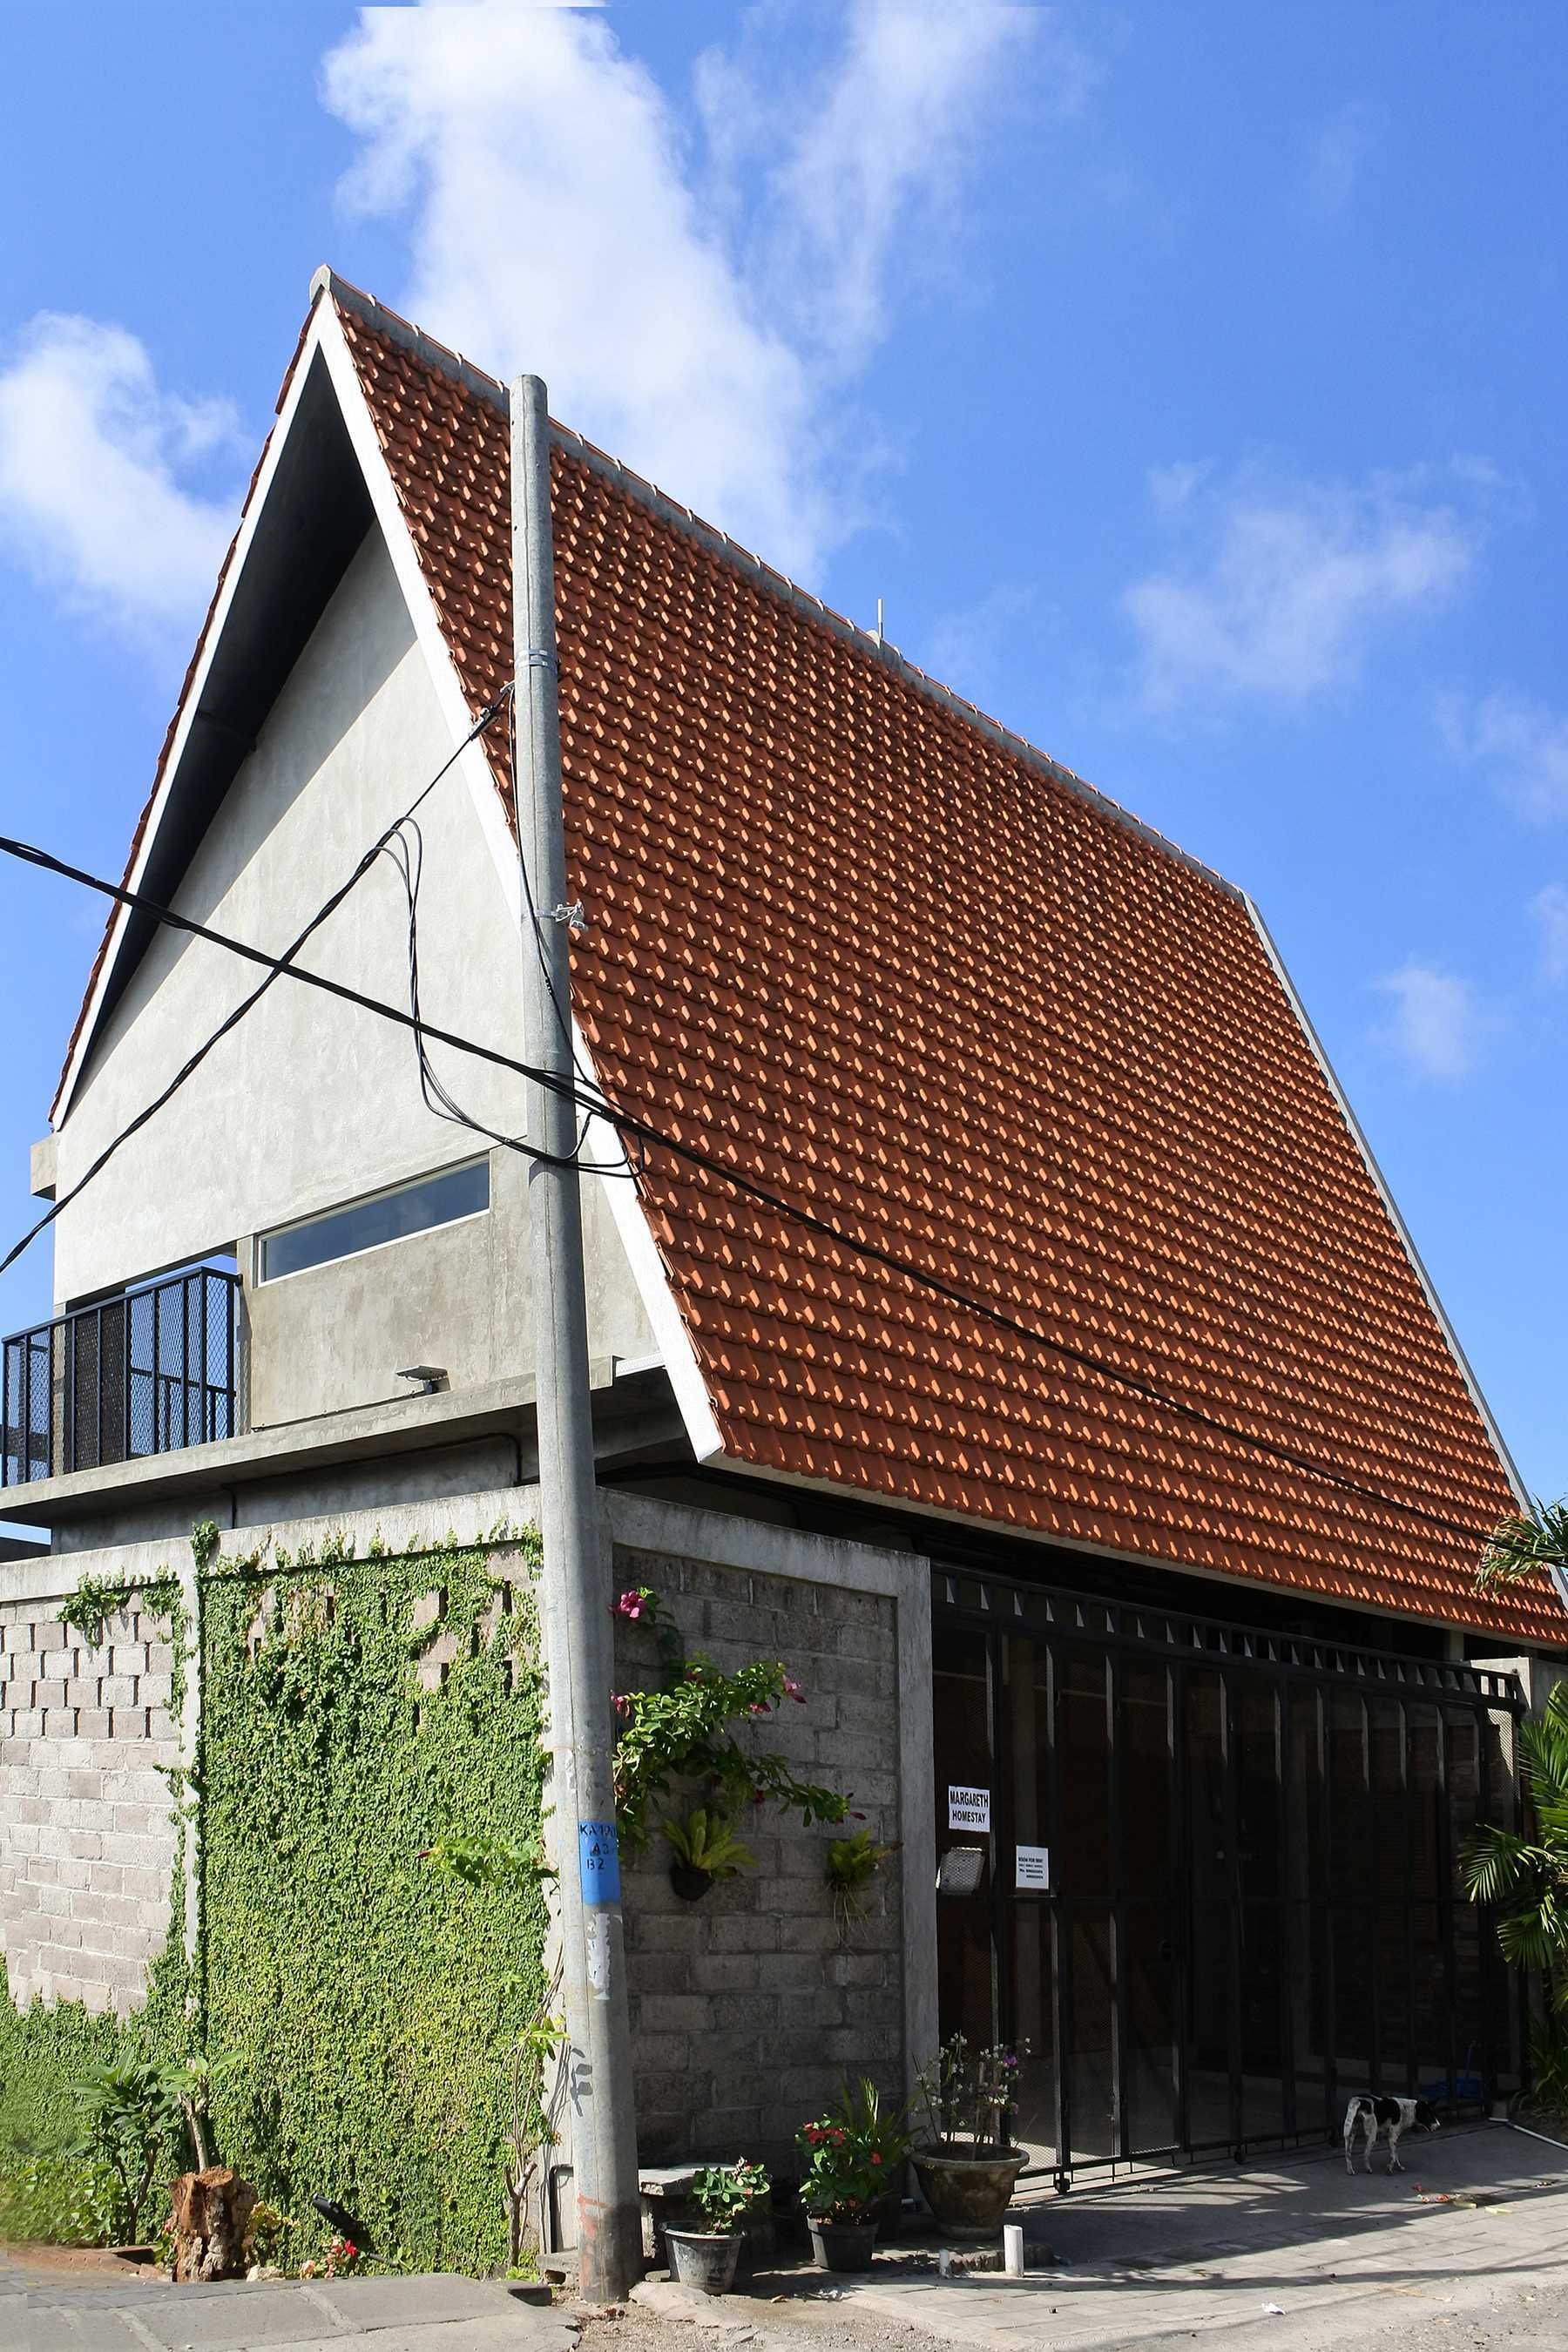 Bentara Indonesia Arsitek Rumah Uluwatu Bali, Indonesia Bali, Indonesia Bentara-Indonesia-Arsitek-Rumah-Uluwatu   65915